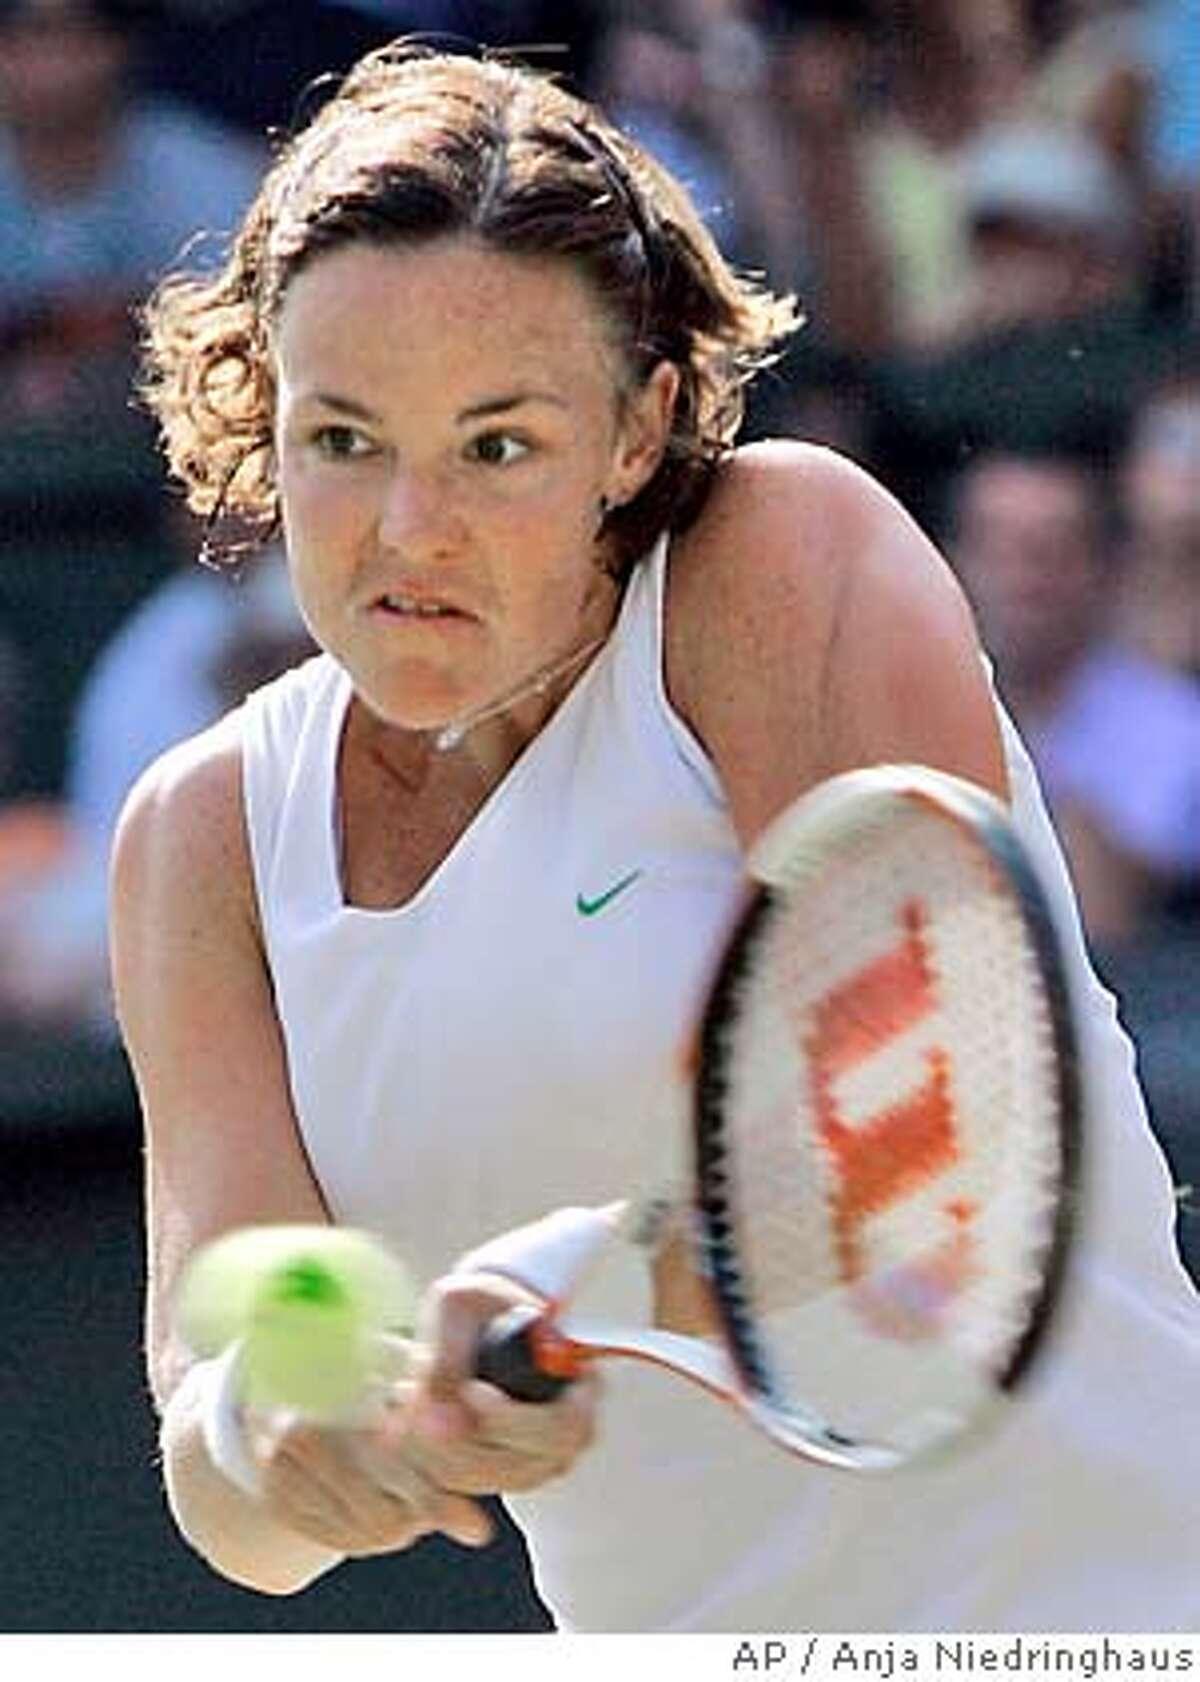 Lindsay Davenport, of the USA, returns to Kim Clijsters, of Belgium, on Centre Court at Wimbledon Monday, June 27, 2005. (AP Photo/ Anja Niedringhaus)